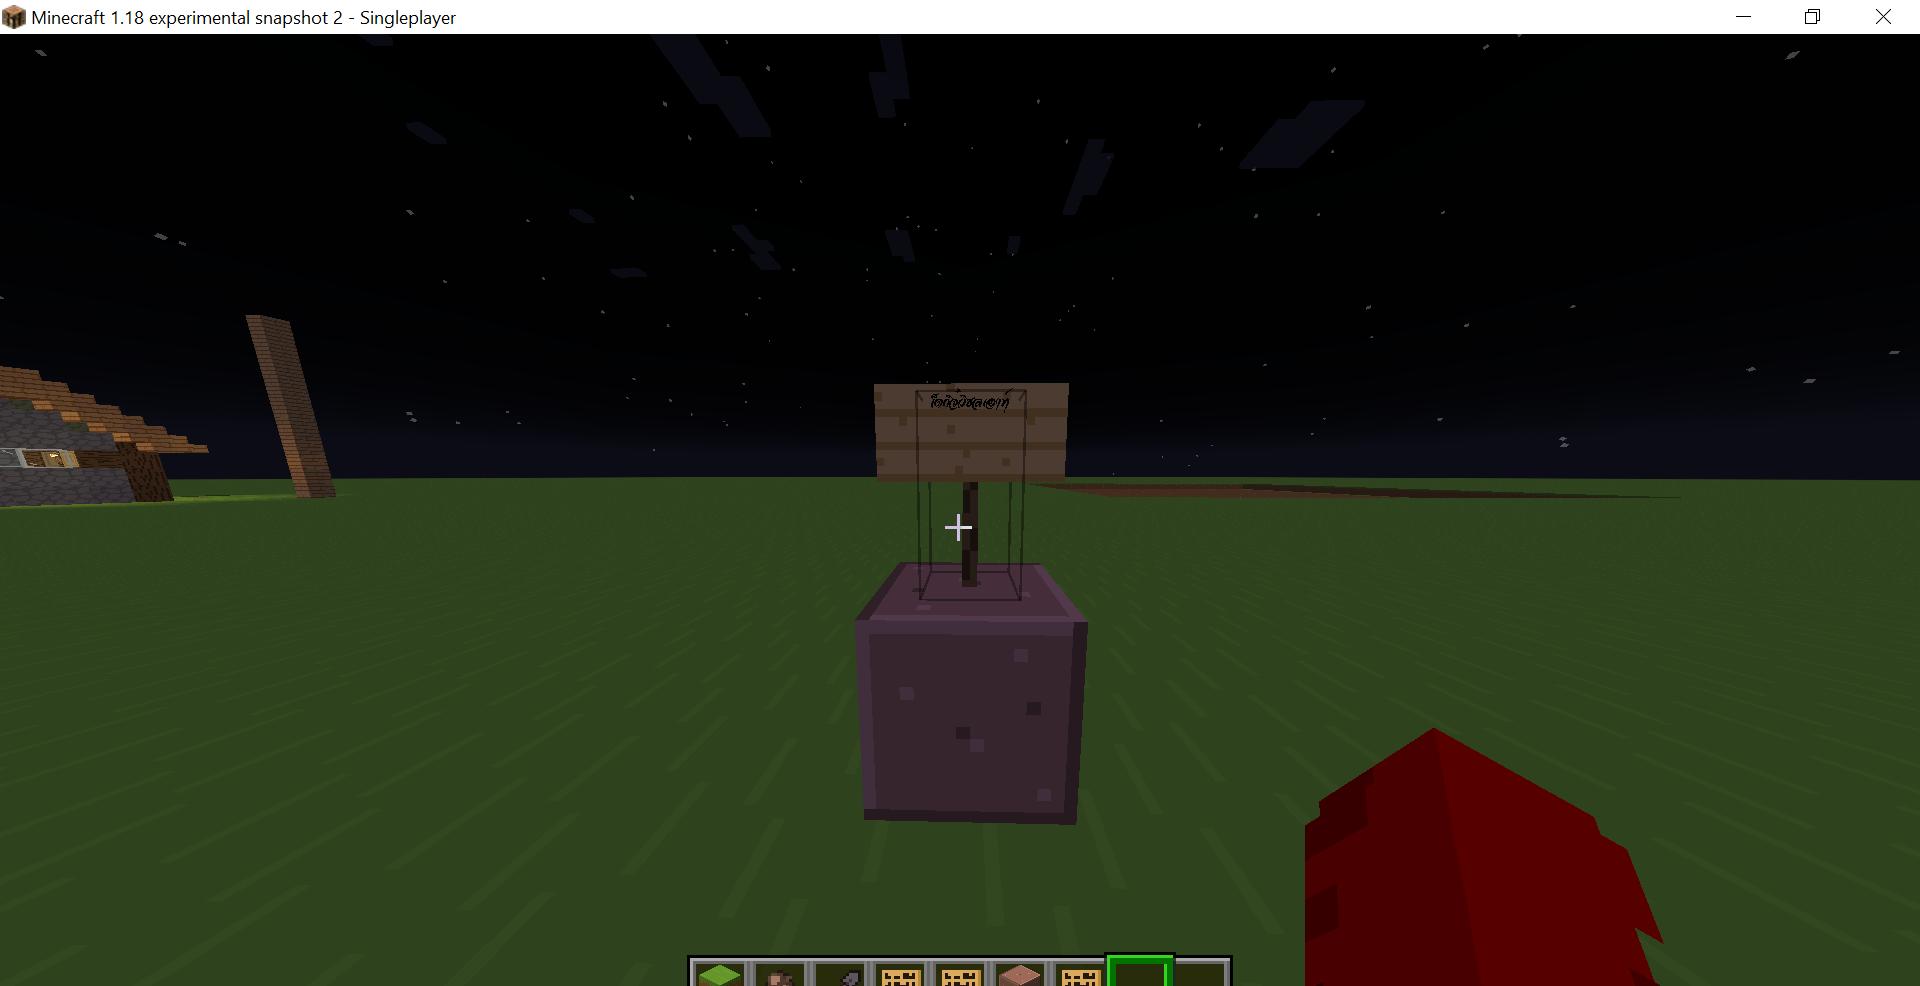 Minecraft 1.18 experimental snapshot 2 8_1_2021 10_04_47 AM.png